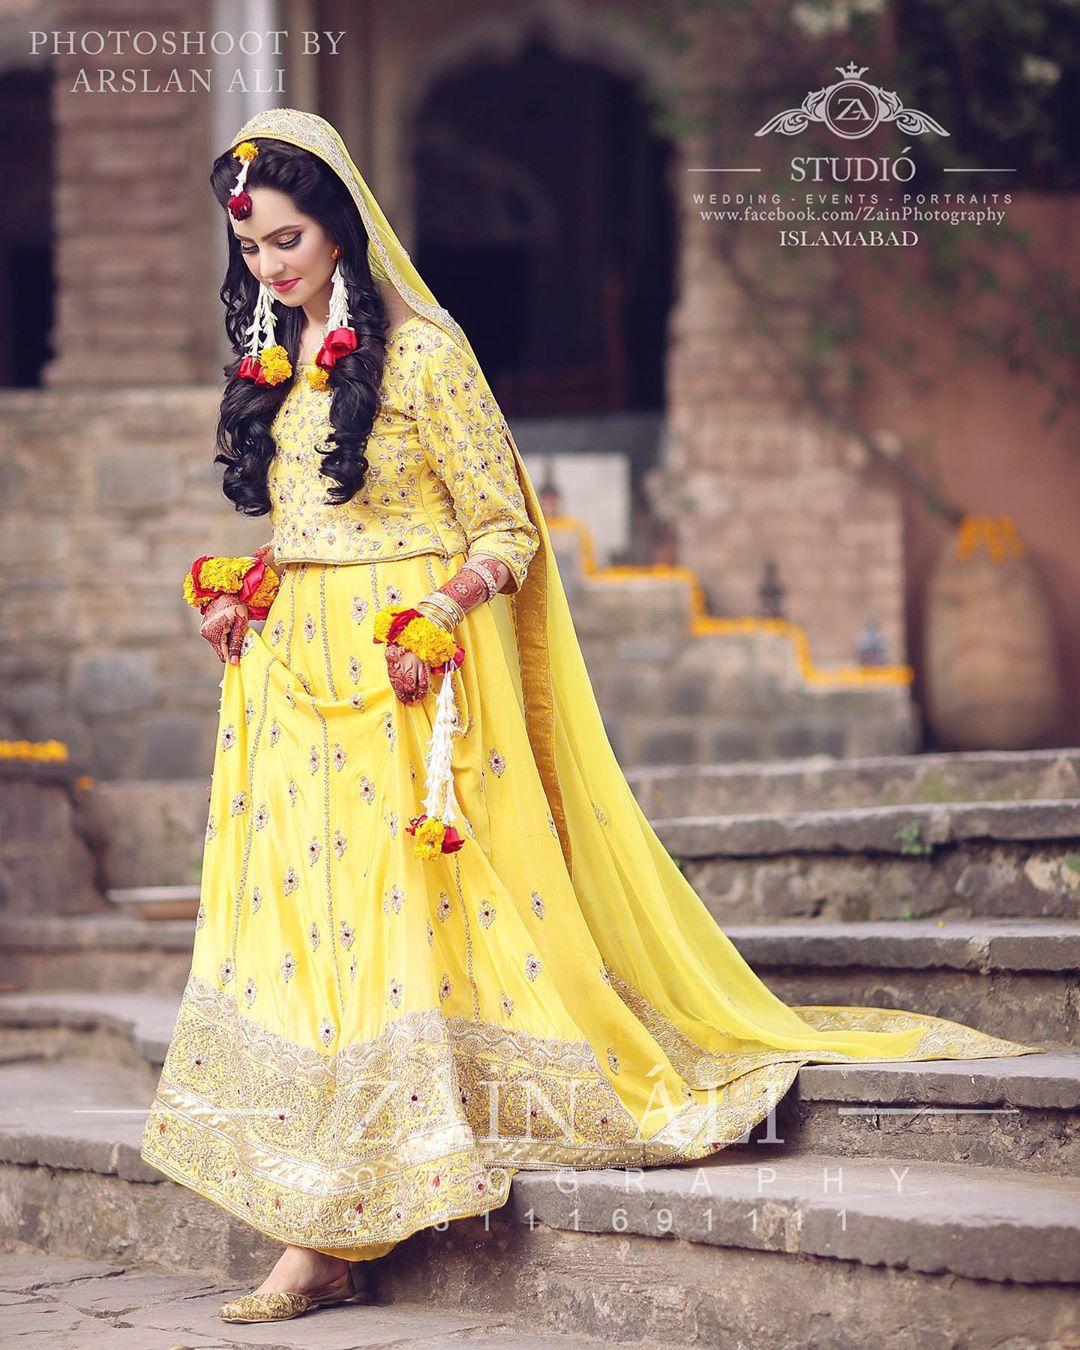 Bridal Mehndi Dresses 2020 Latest Trends In Pakistan